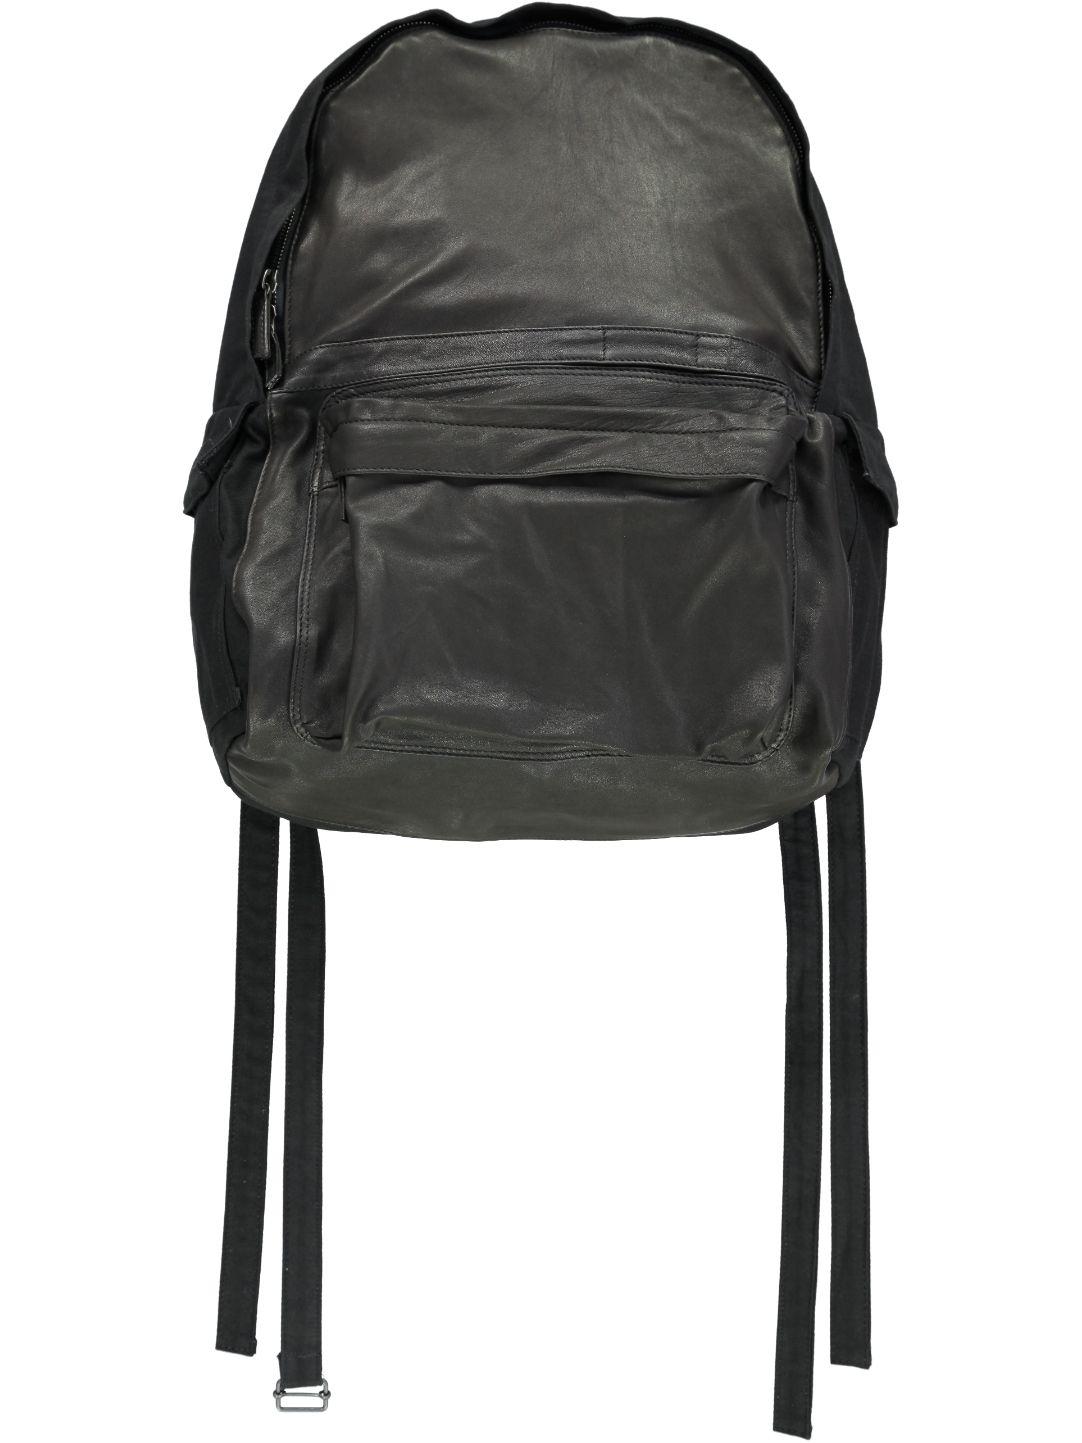 Ann Demeulemeester Men's Leather Front Back Pack